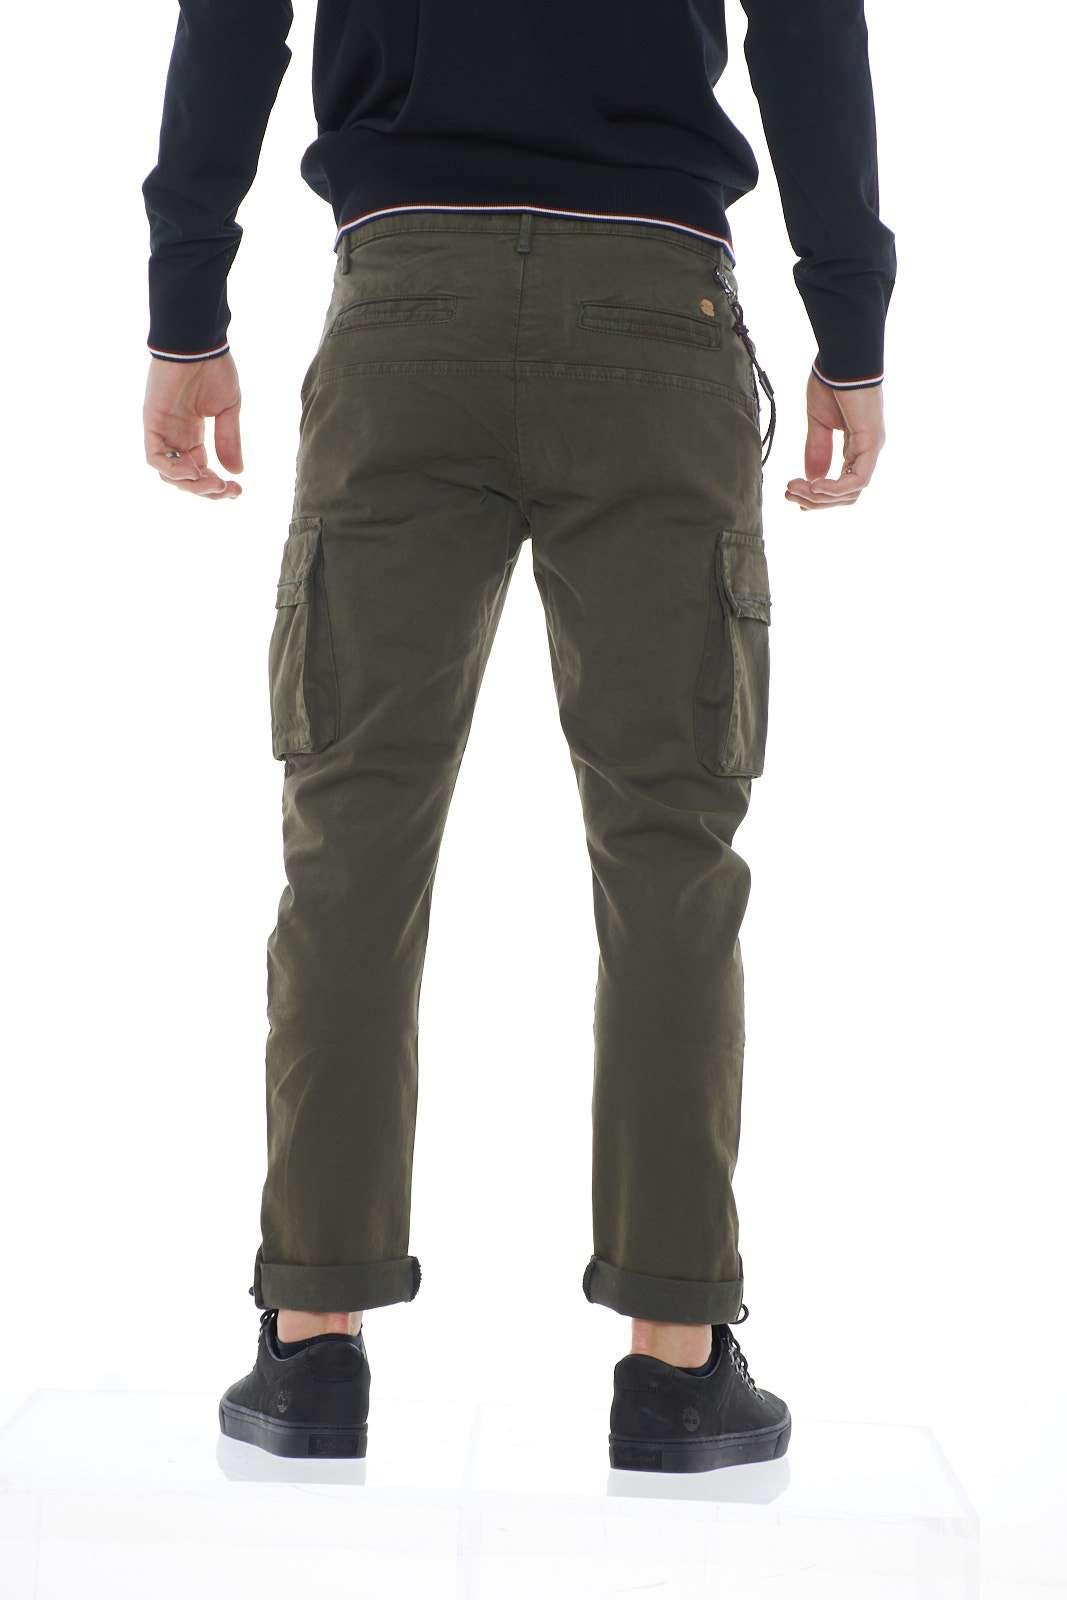 https://www.parmax.com/media/catalog/product/A/I/AI-outlet_parmax-pantaloni-uomo-Squad-gvc9711-C.jpg